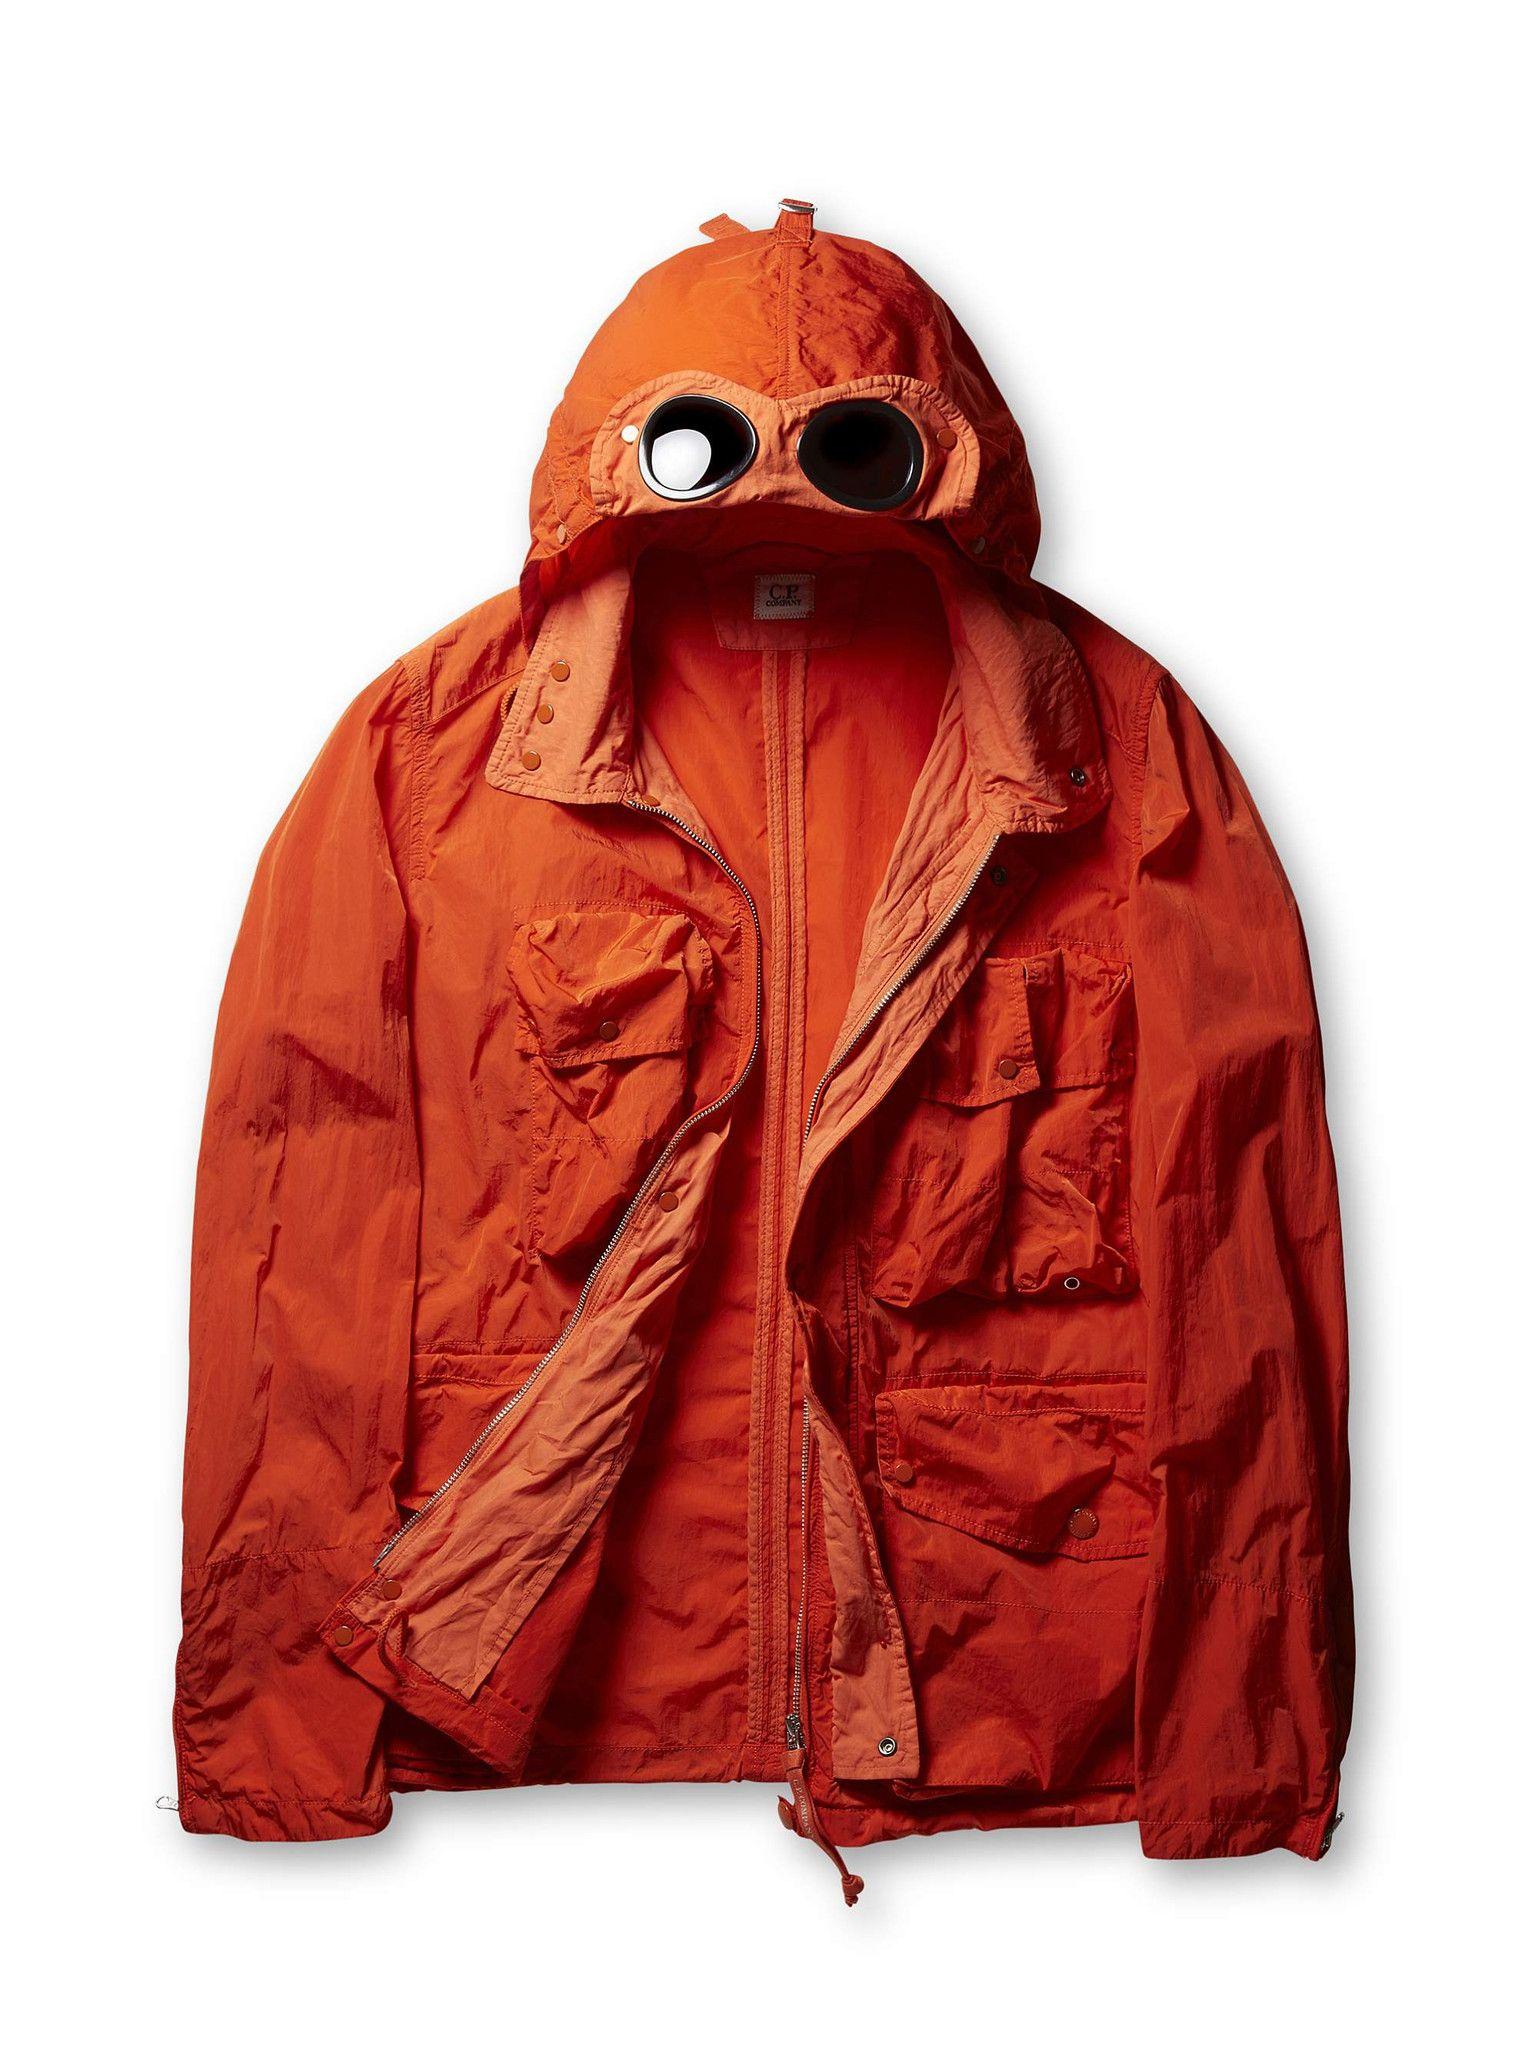 bddac7355 C.P. Company - C.P. Company Frosted Nylon Cotton Goggle Hood Field ...